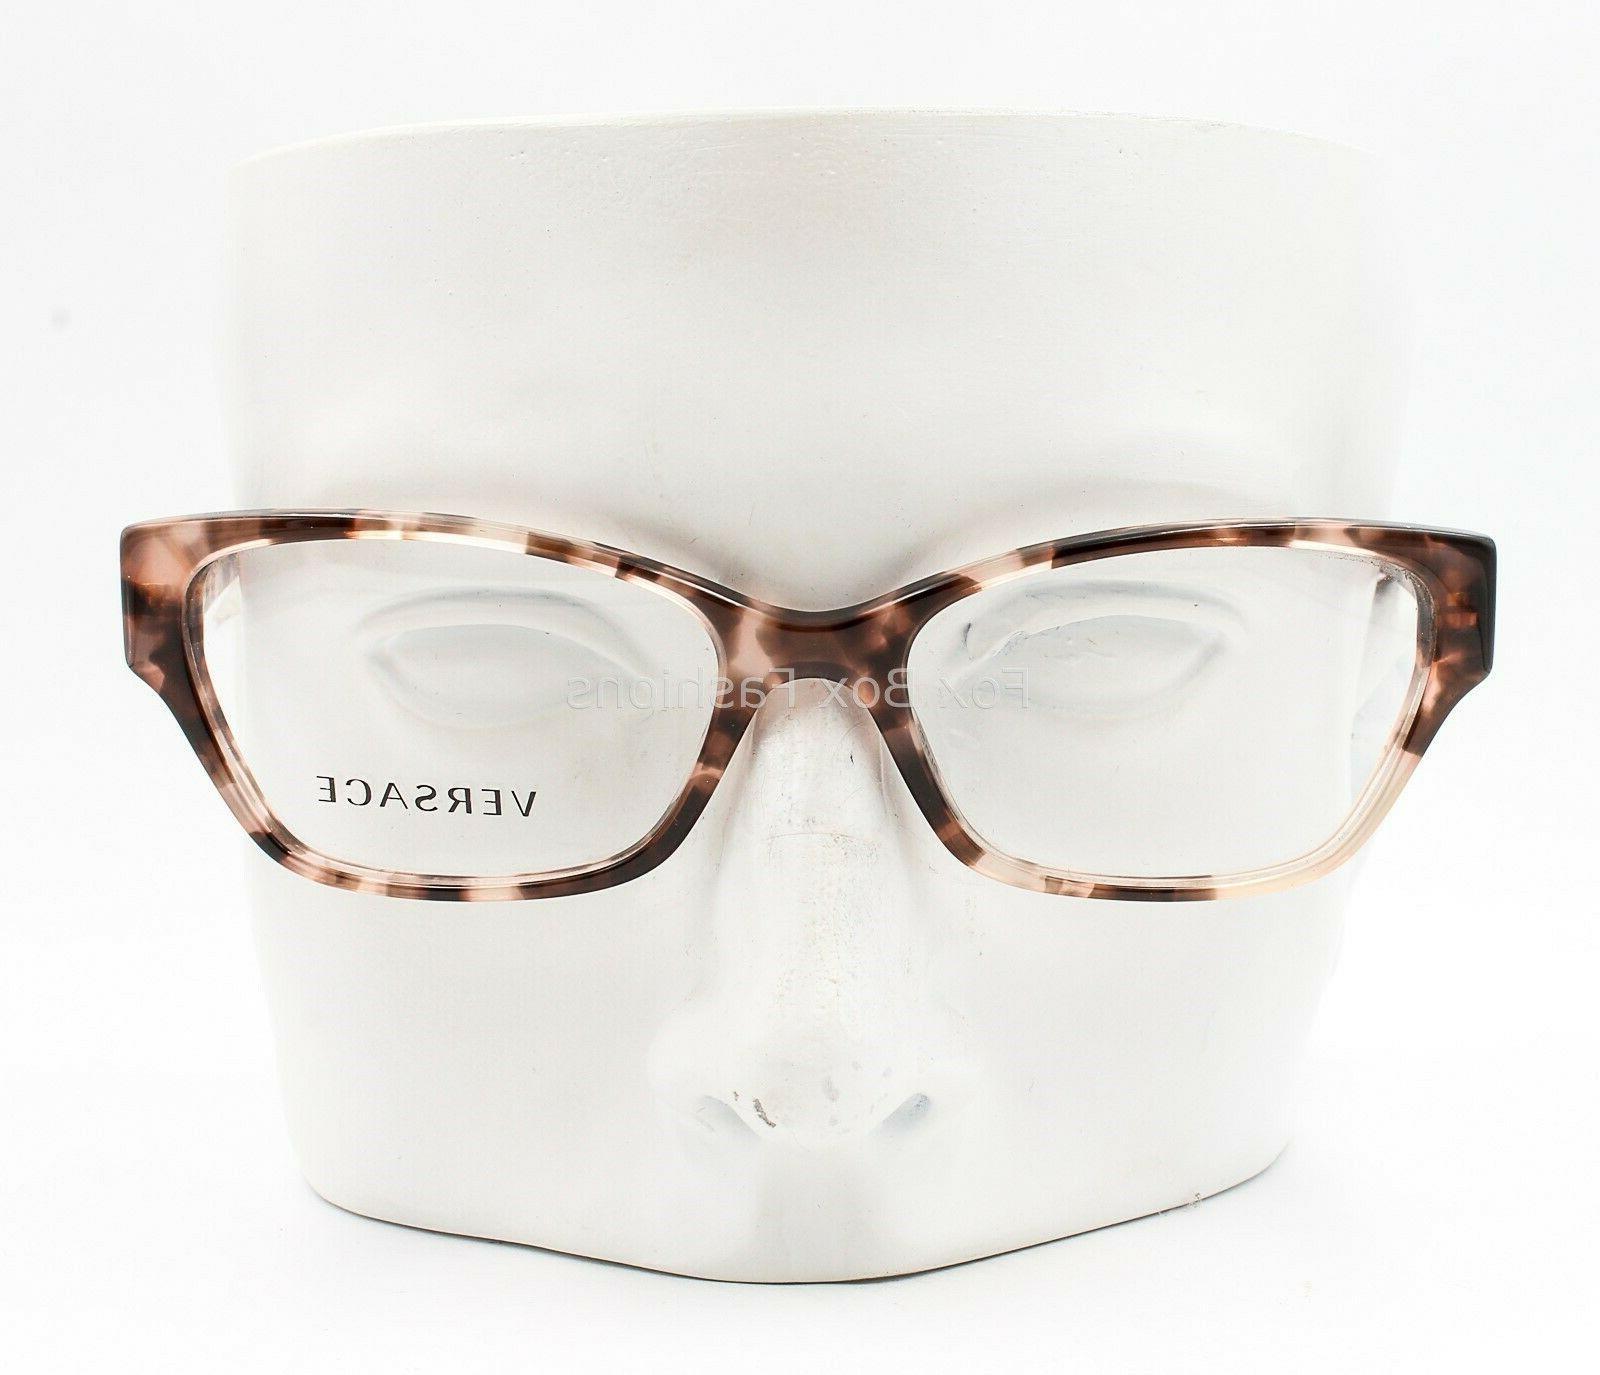 Versace Frames Glasses